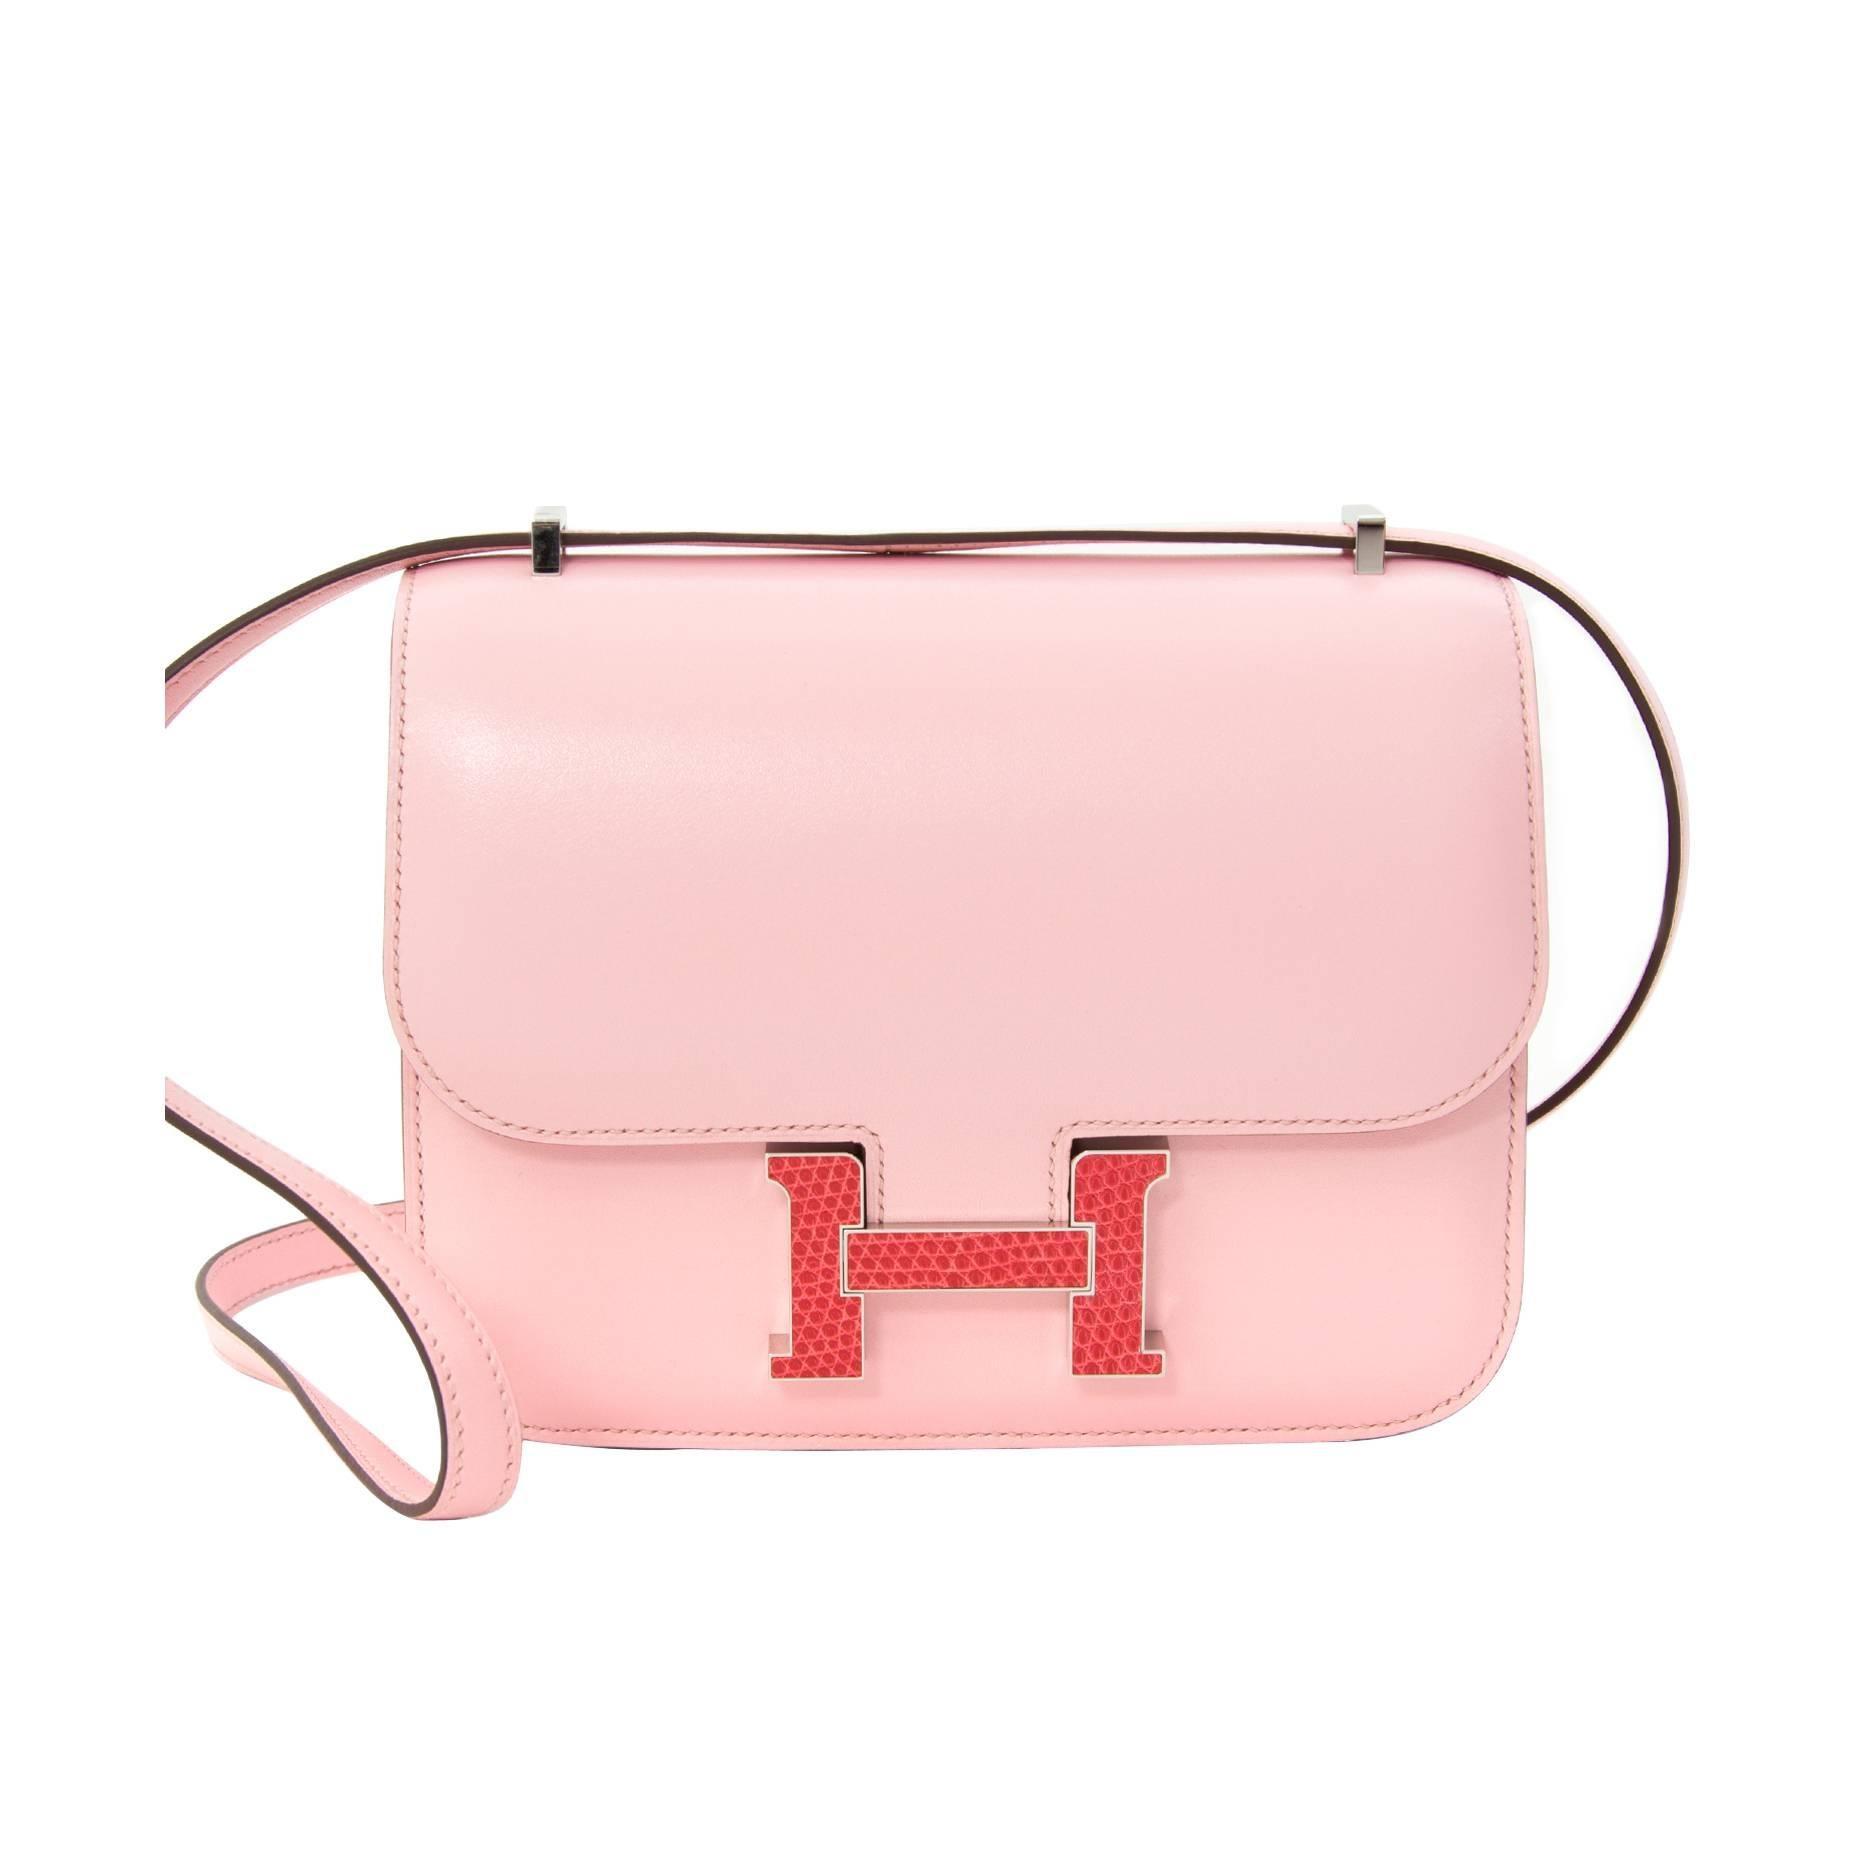 93ac924e1640 Hermes Constance Mini Bags - 23 For Sale on 1stdibs